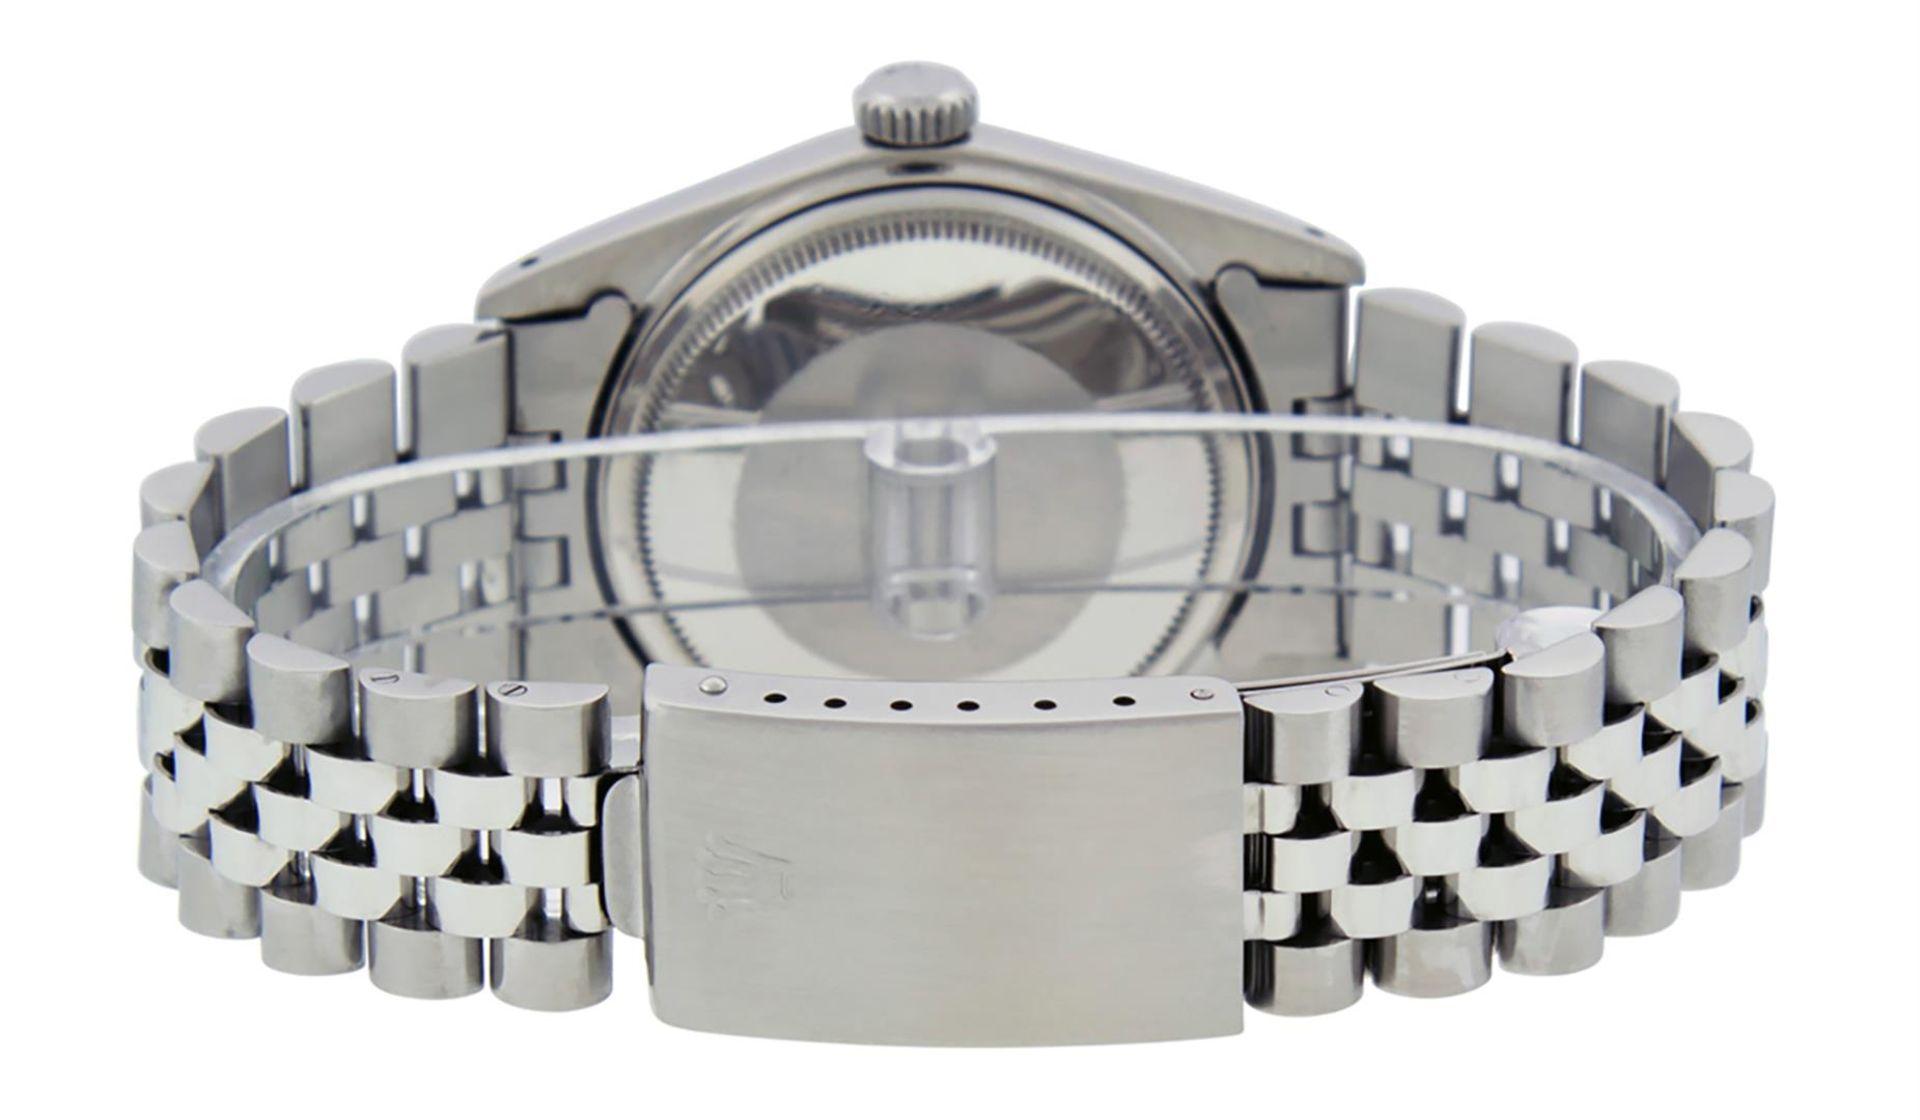 Rolex Mens Stainless Black Diamond 36MM Datejust Wristwatch - Image 6 of 9